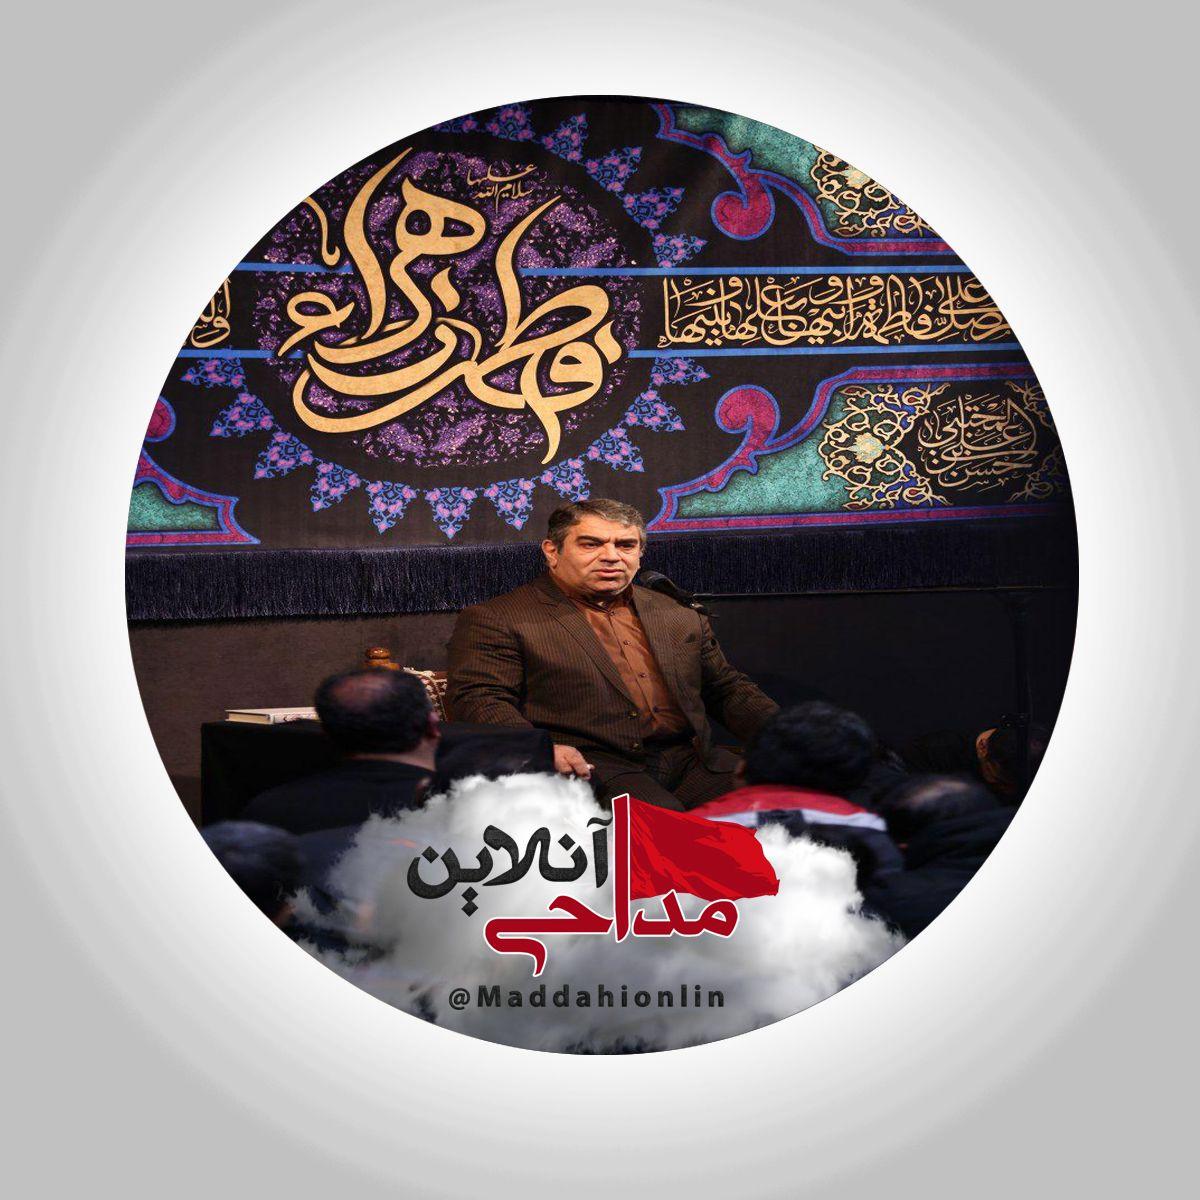 حاج حسن خلج شب پنجم محرم 98